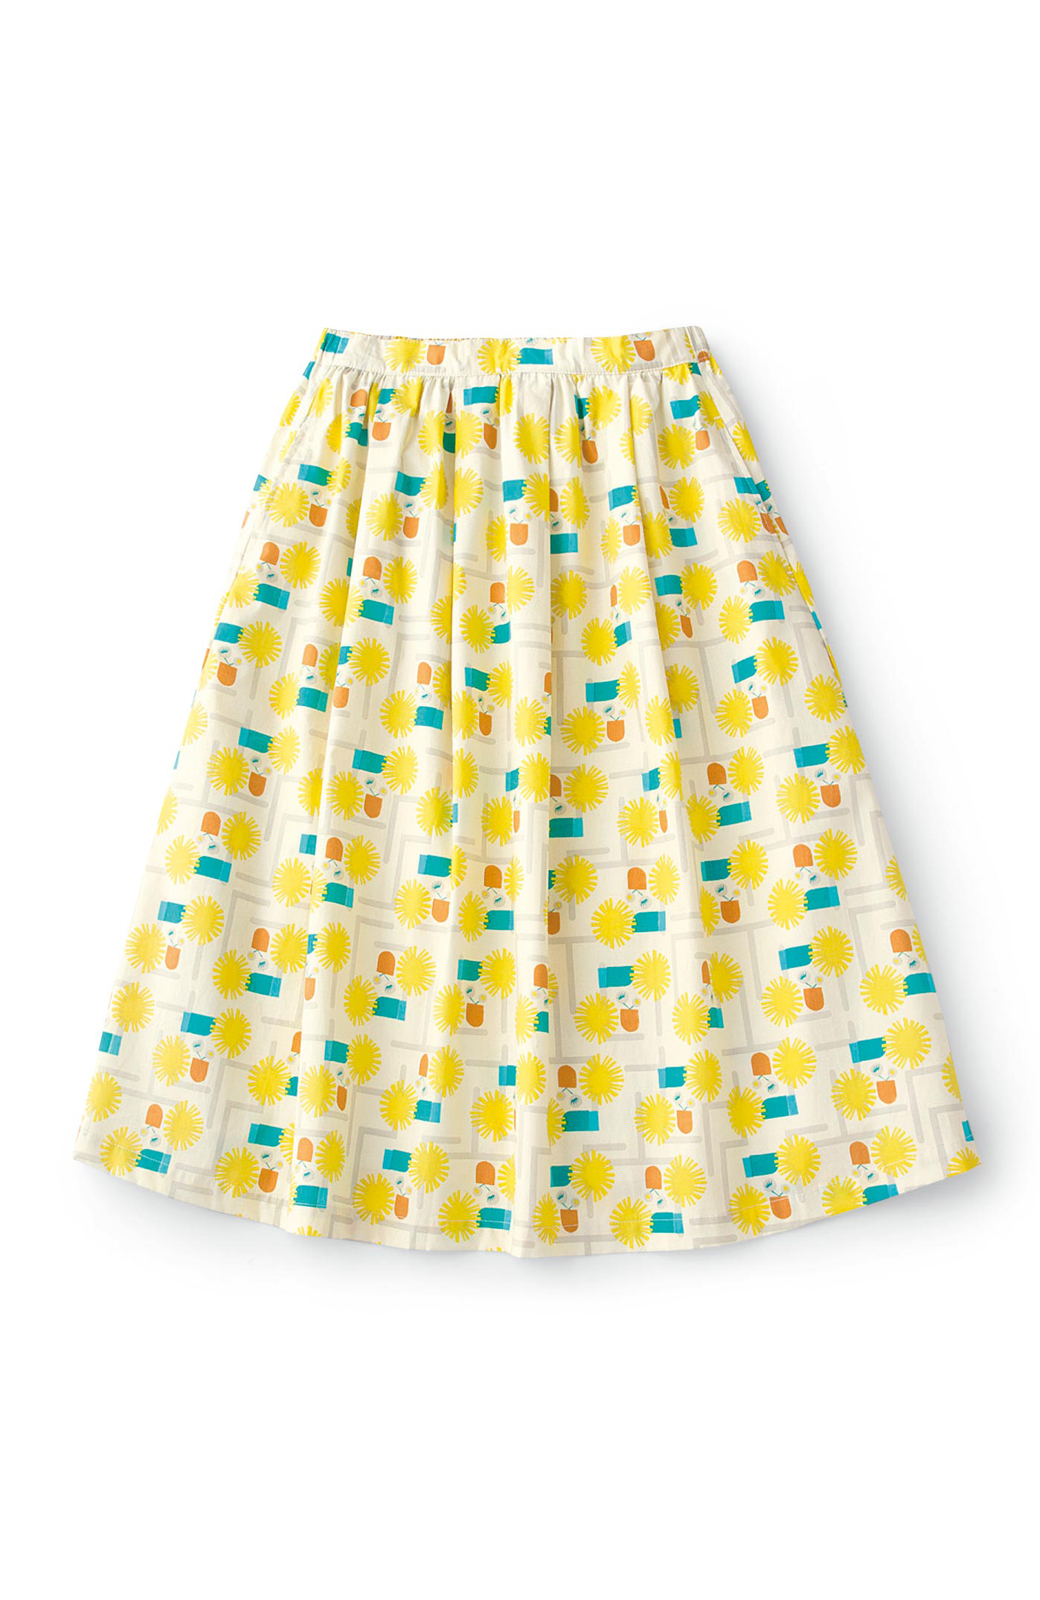 haco! ユニカラート 漆嶌知子 たんぽぽ スカート <イエロー>の商品写真1